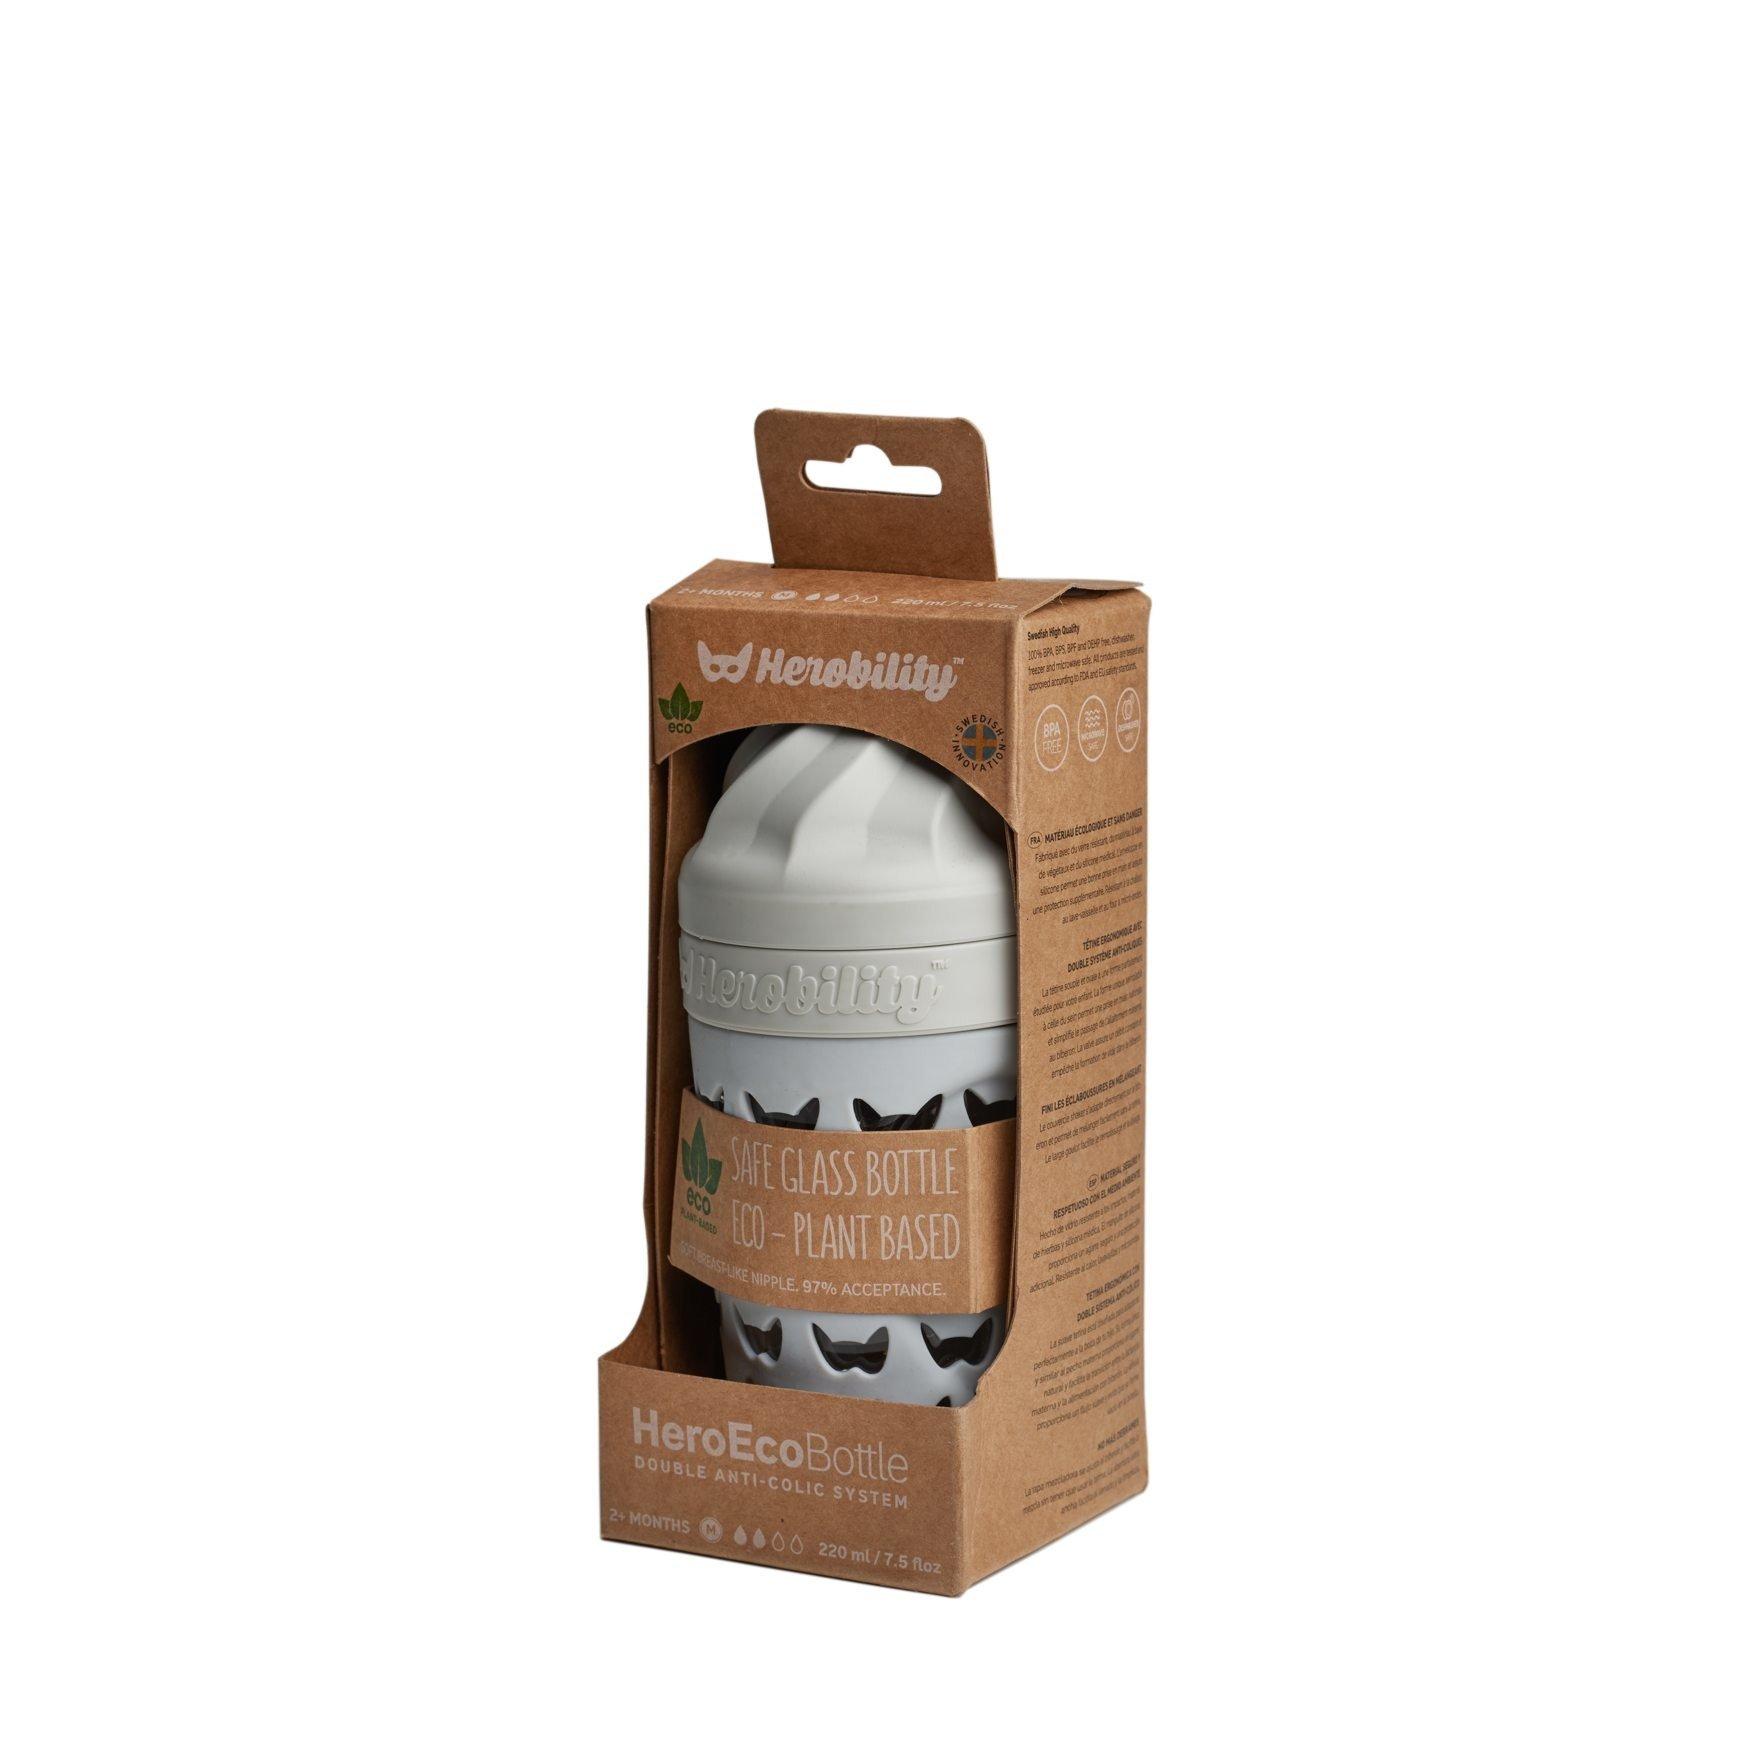 Herobility - butelka antykolkowa HeroEcoBottle - szara, 220 ml